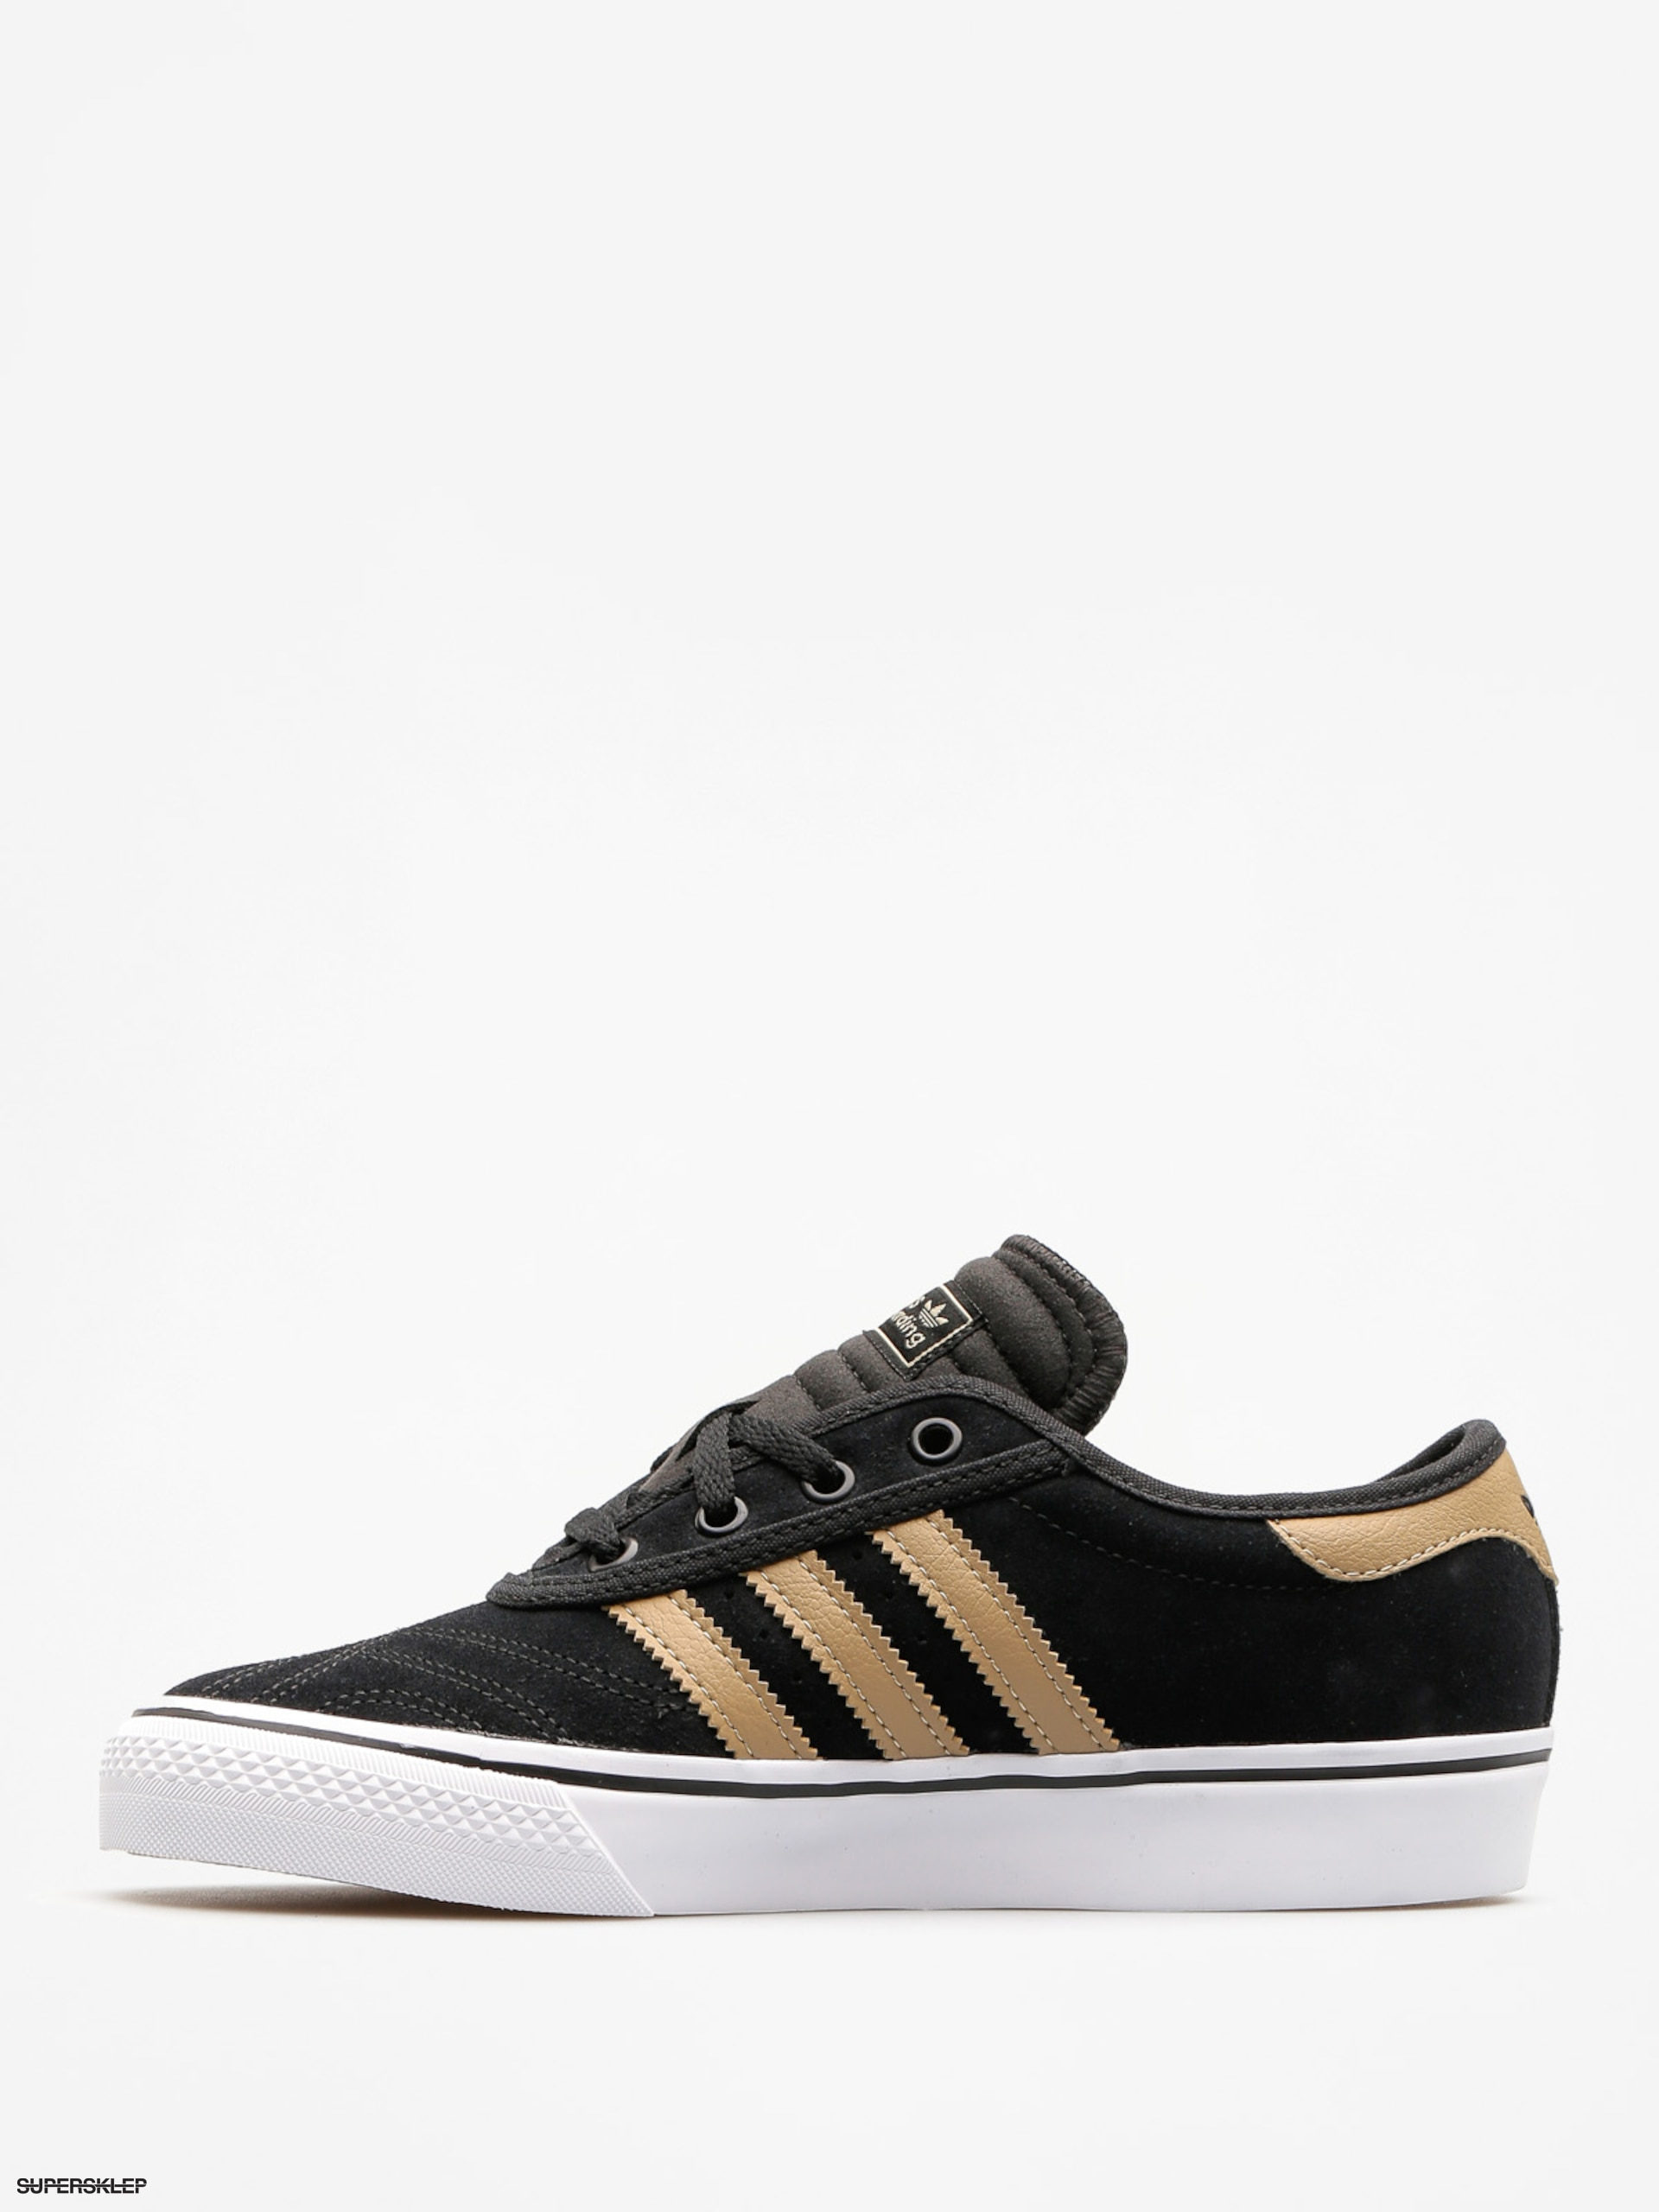 sports shoes e7a45 9287b Topánky adidas Adi Ease Premiere (cblackrawgolftwwht)